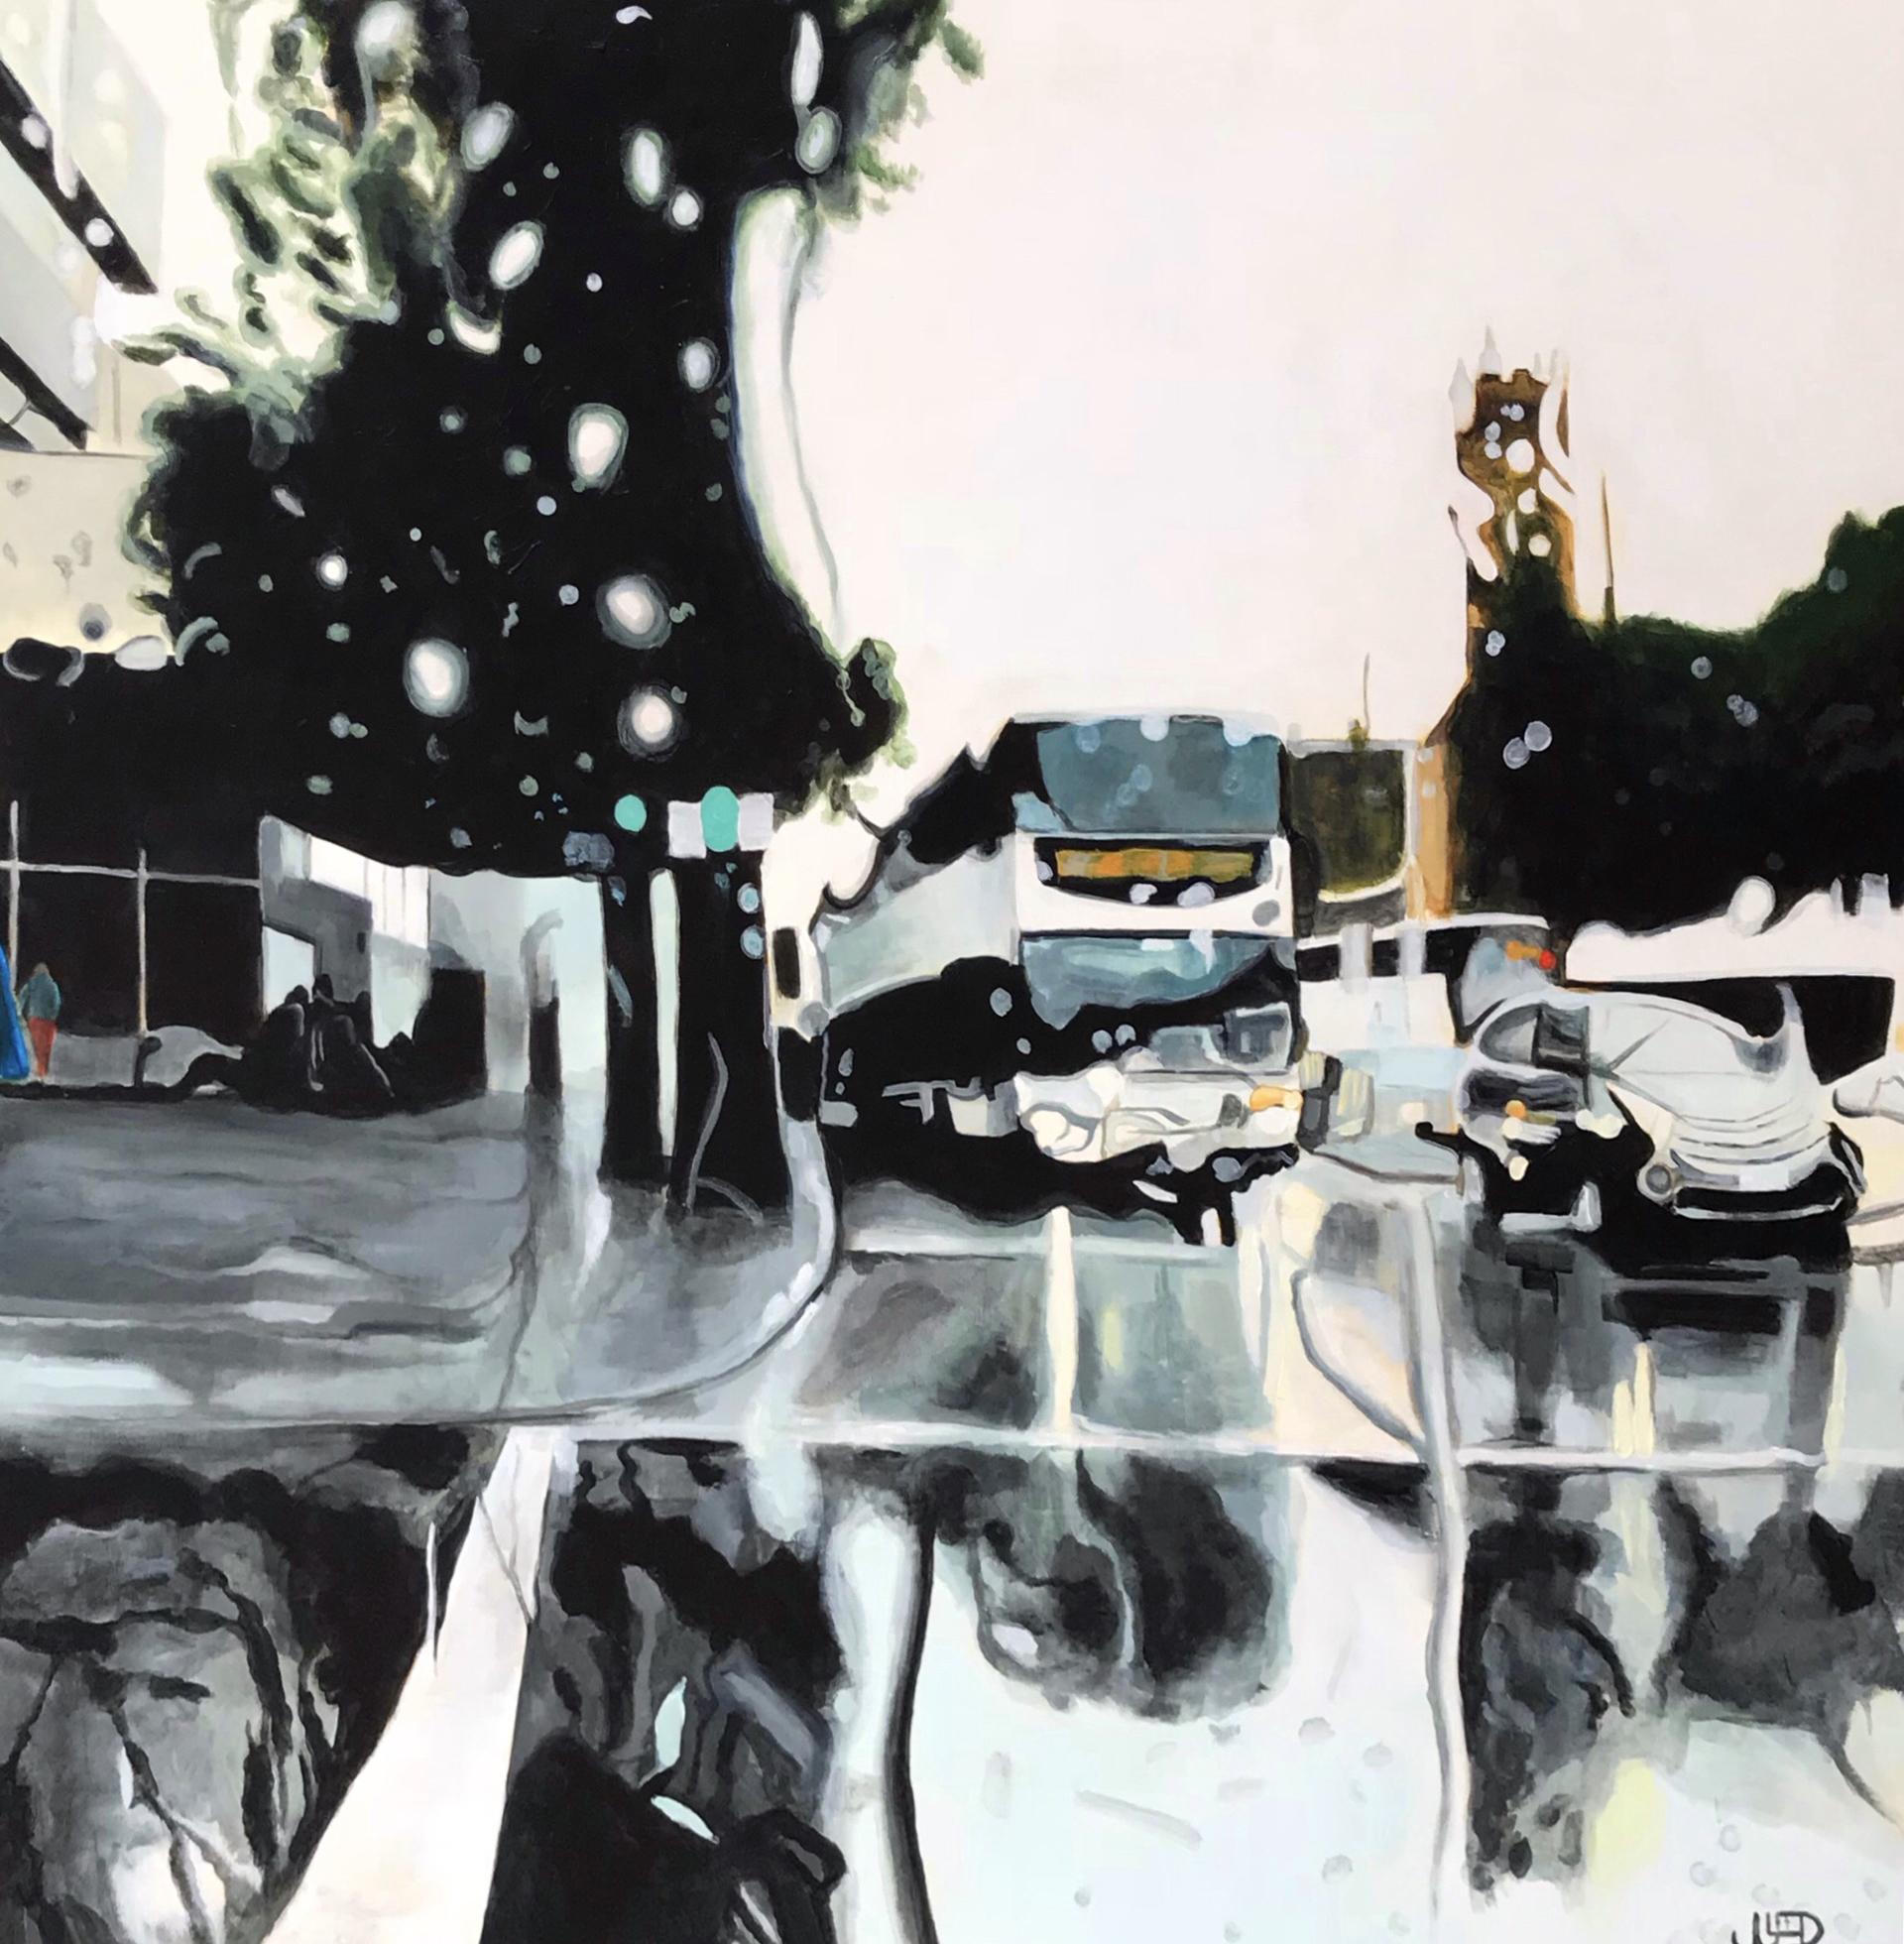 Jonathan-Gleed-Just-Another-Weekday-2018-Acrylic-On-Panel-36x36-3000-Online-Art-Galleries